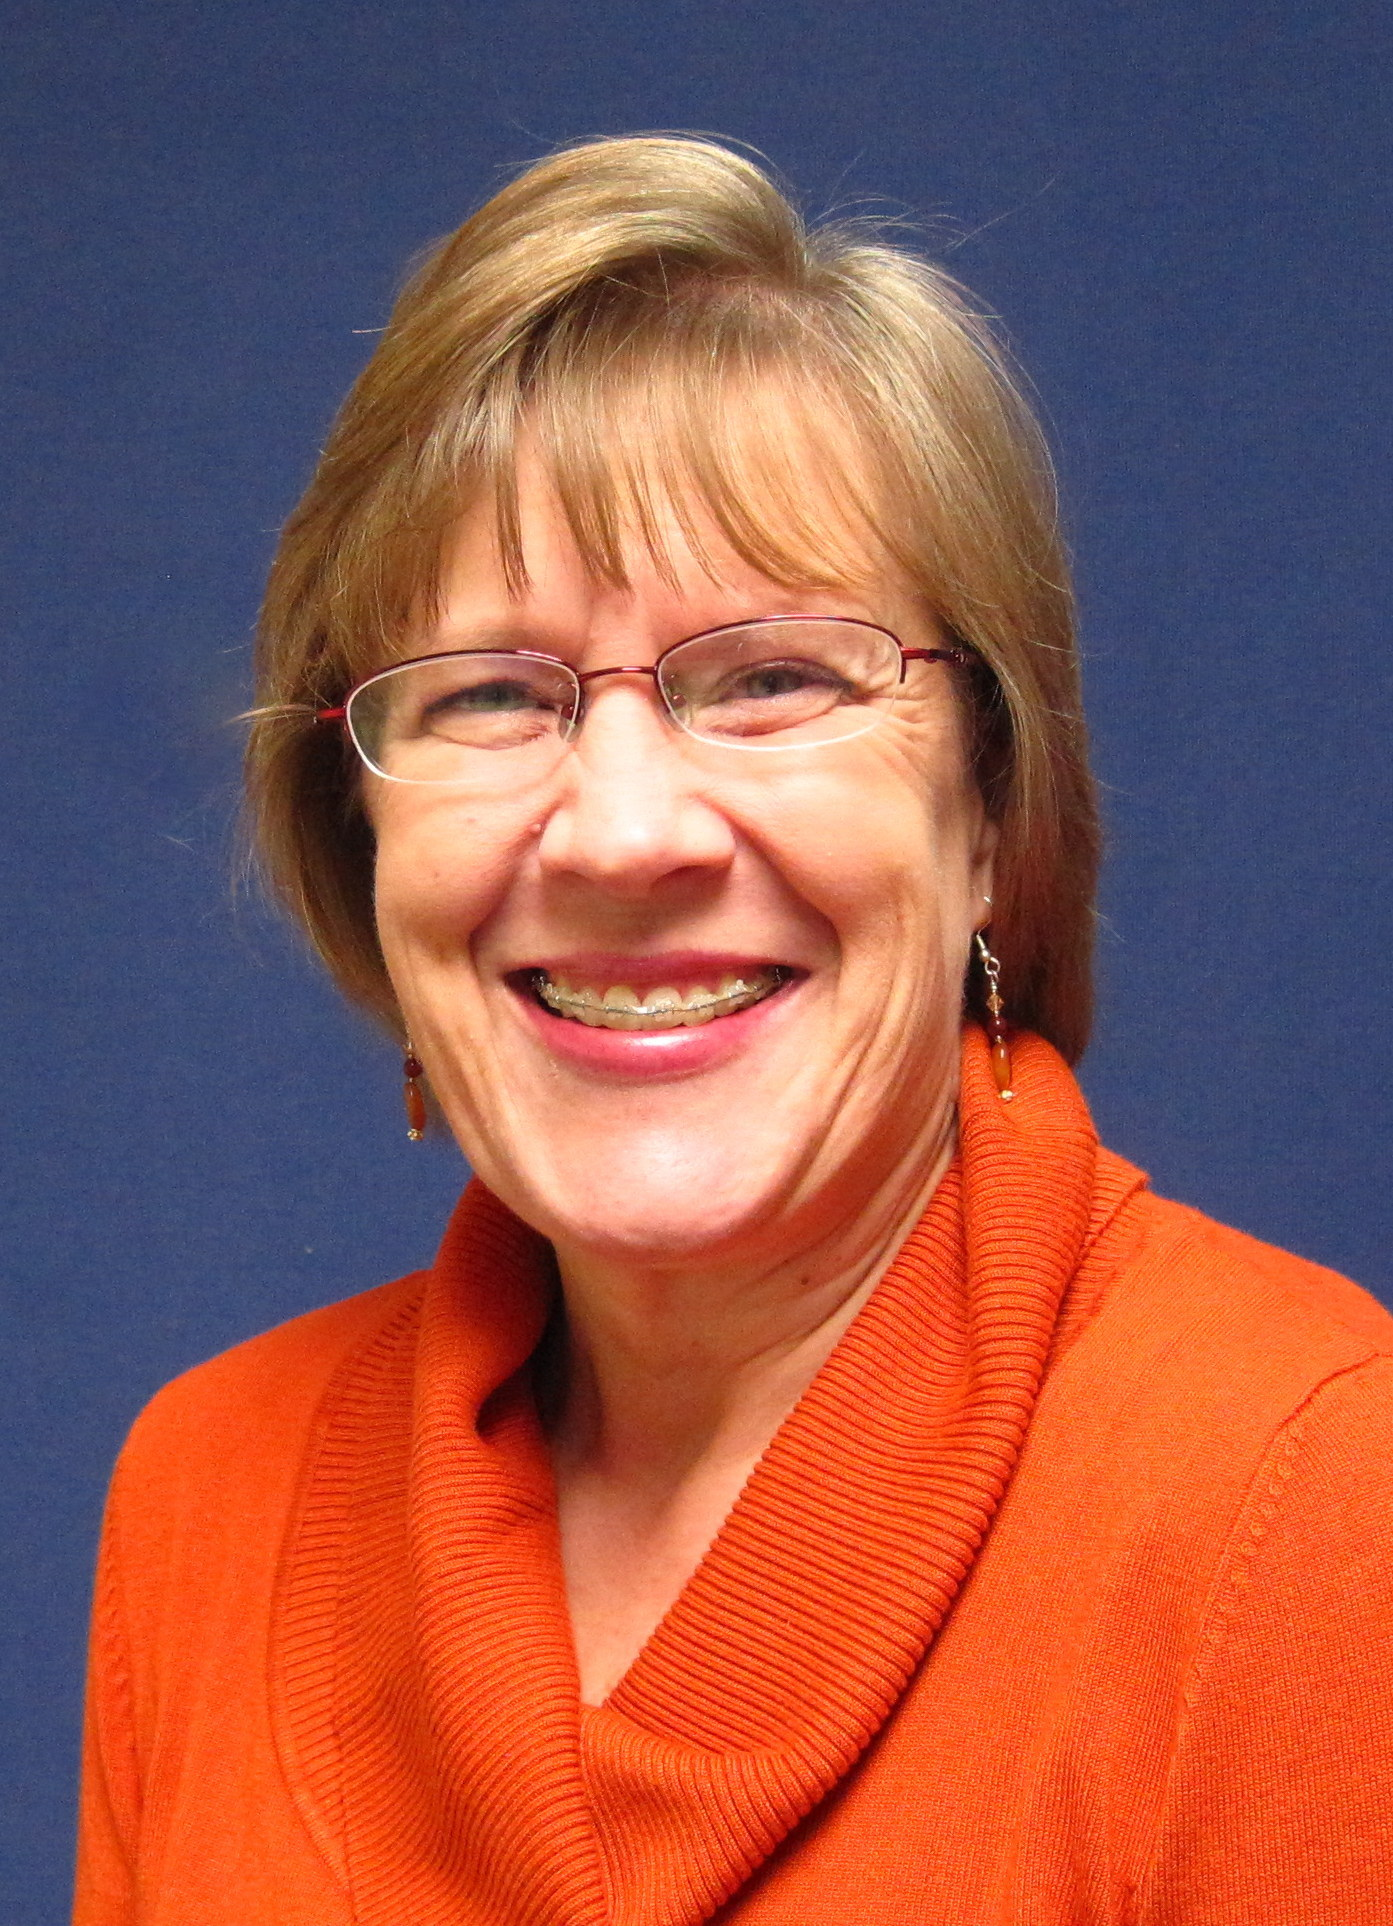 Cheryl Mattil